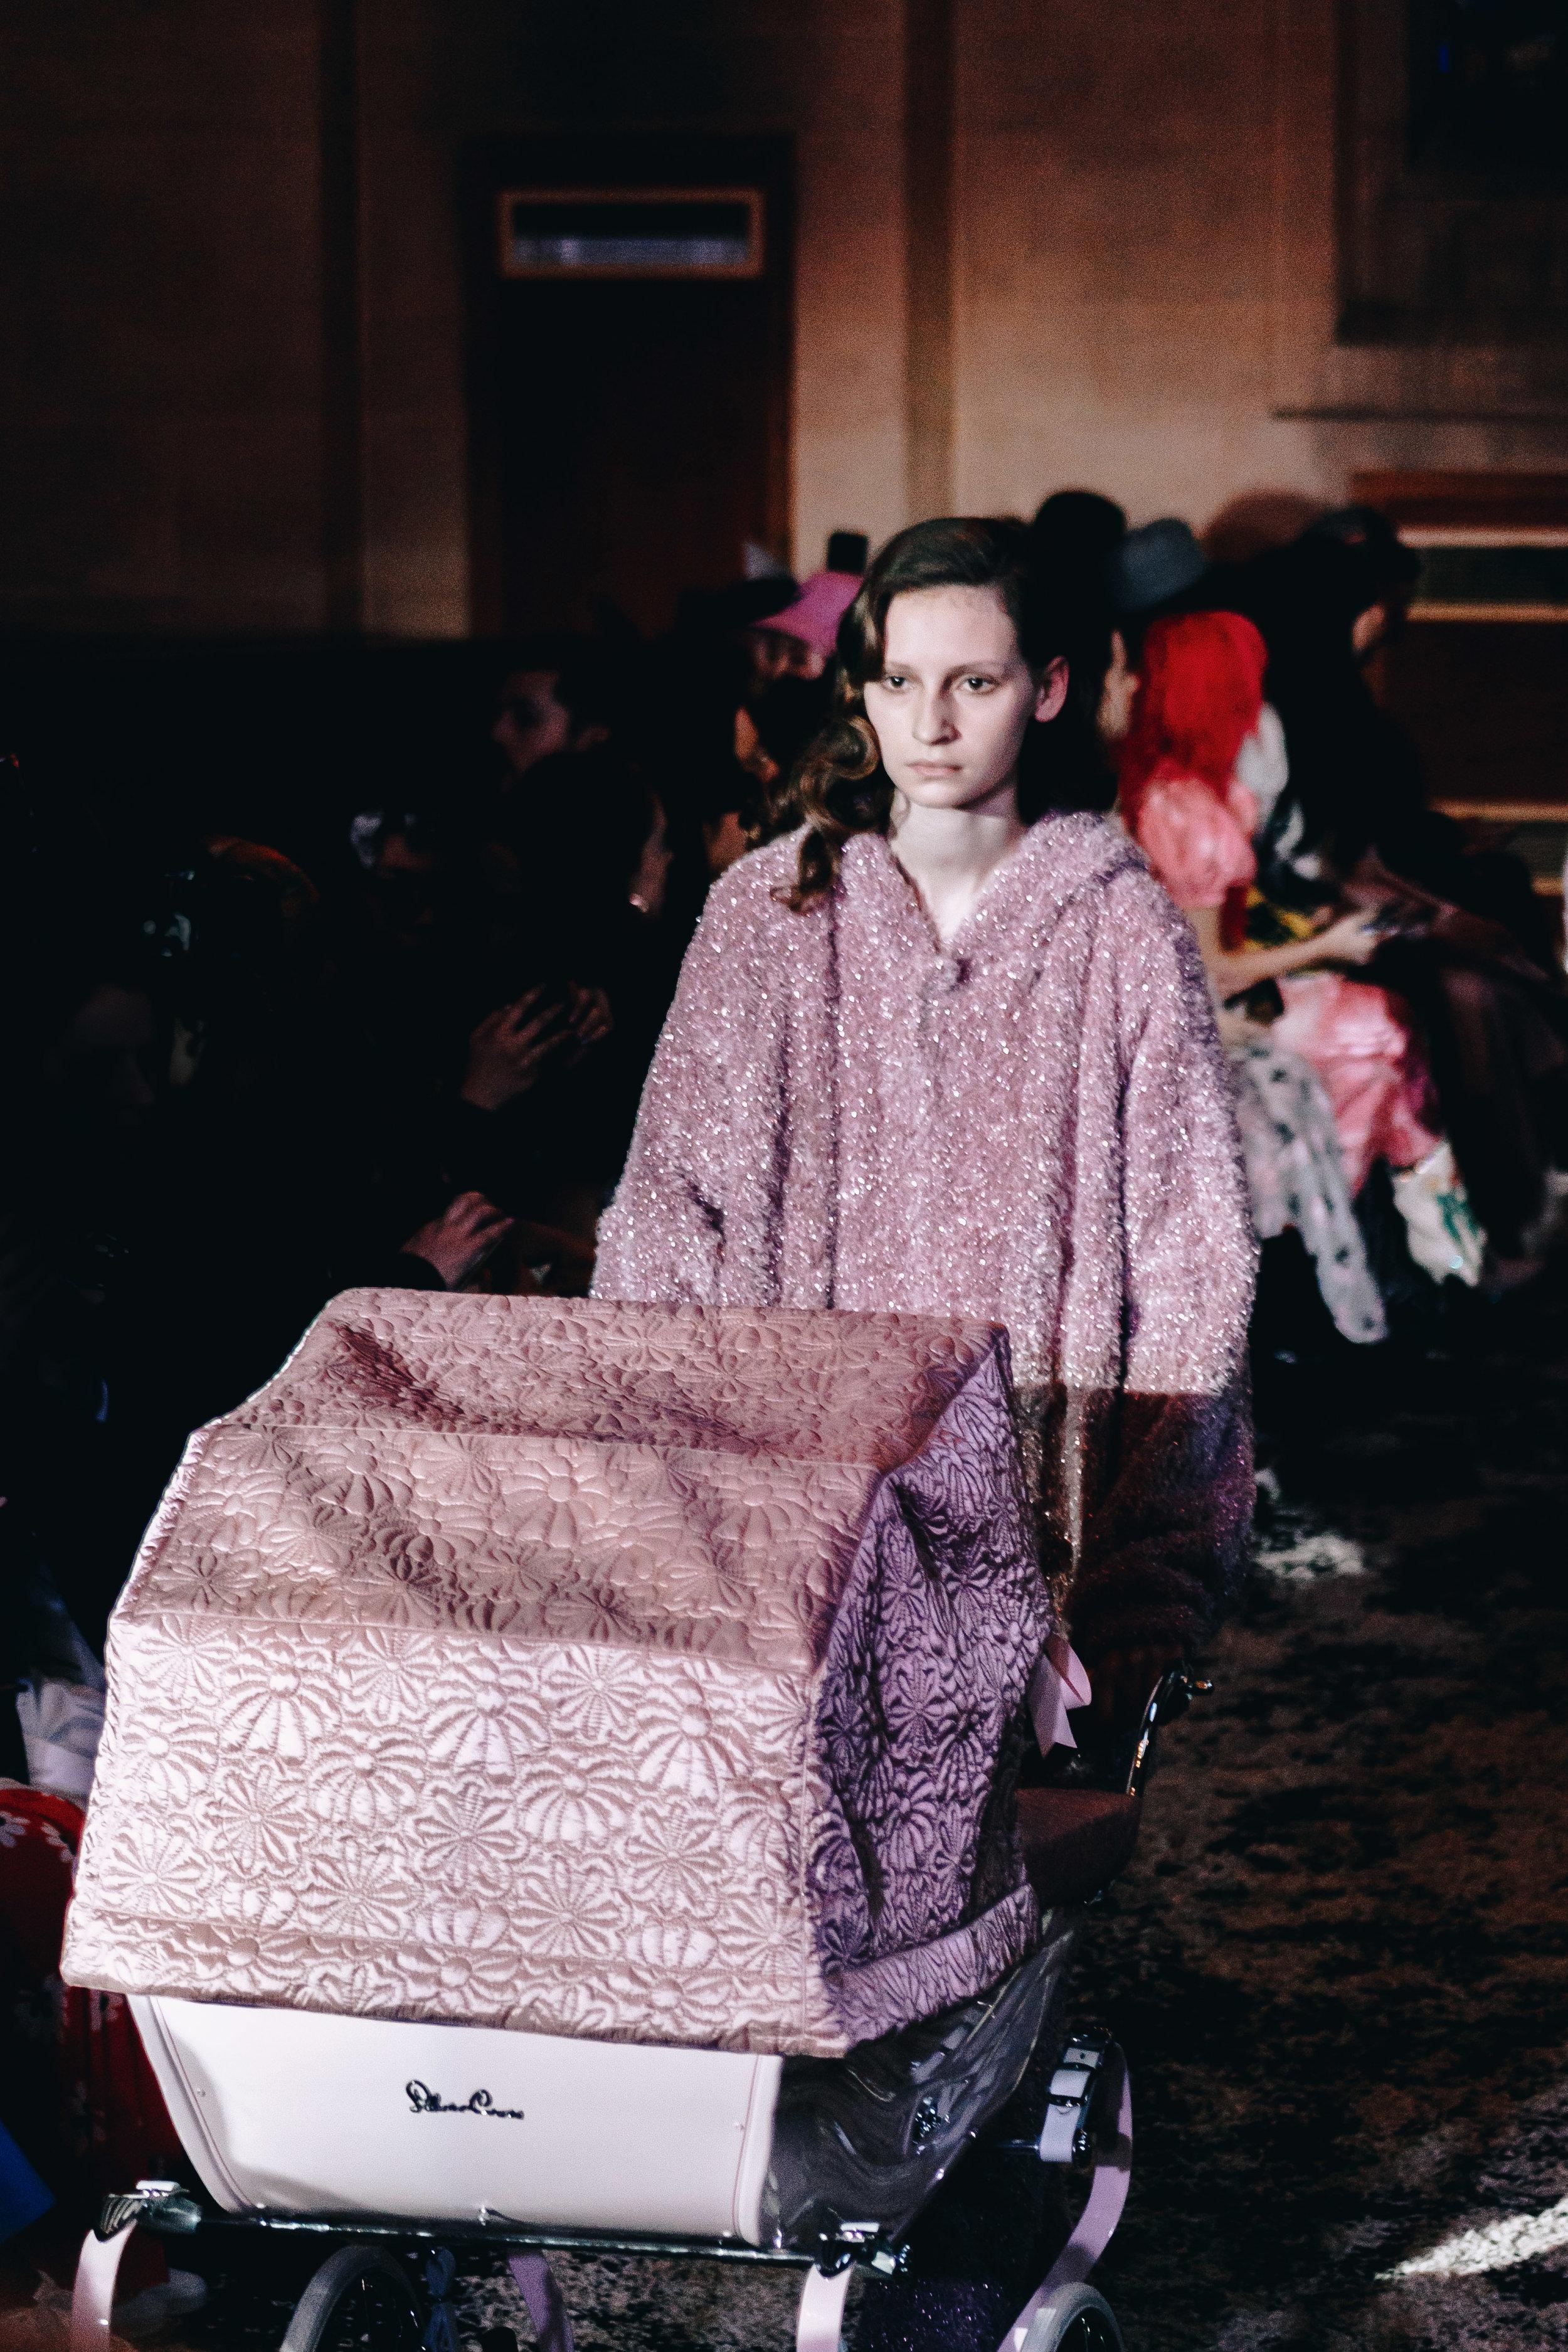 London fashion week Ryan Lo AW19 Adorngirl 11.jpg